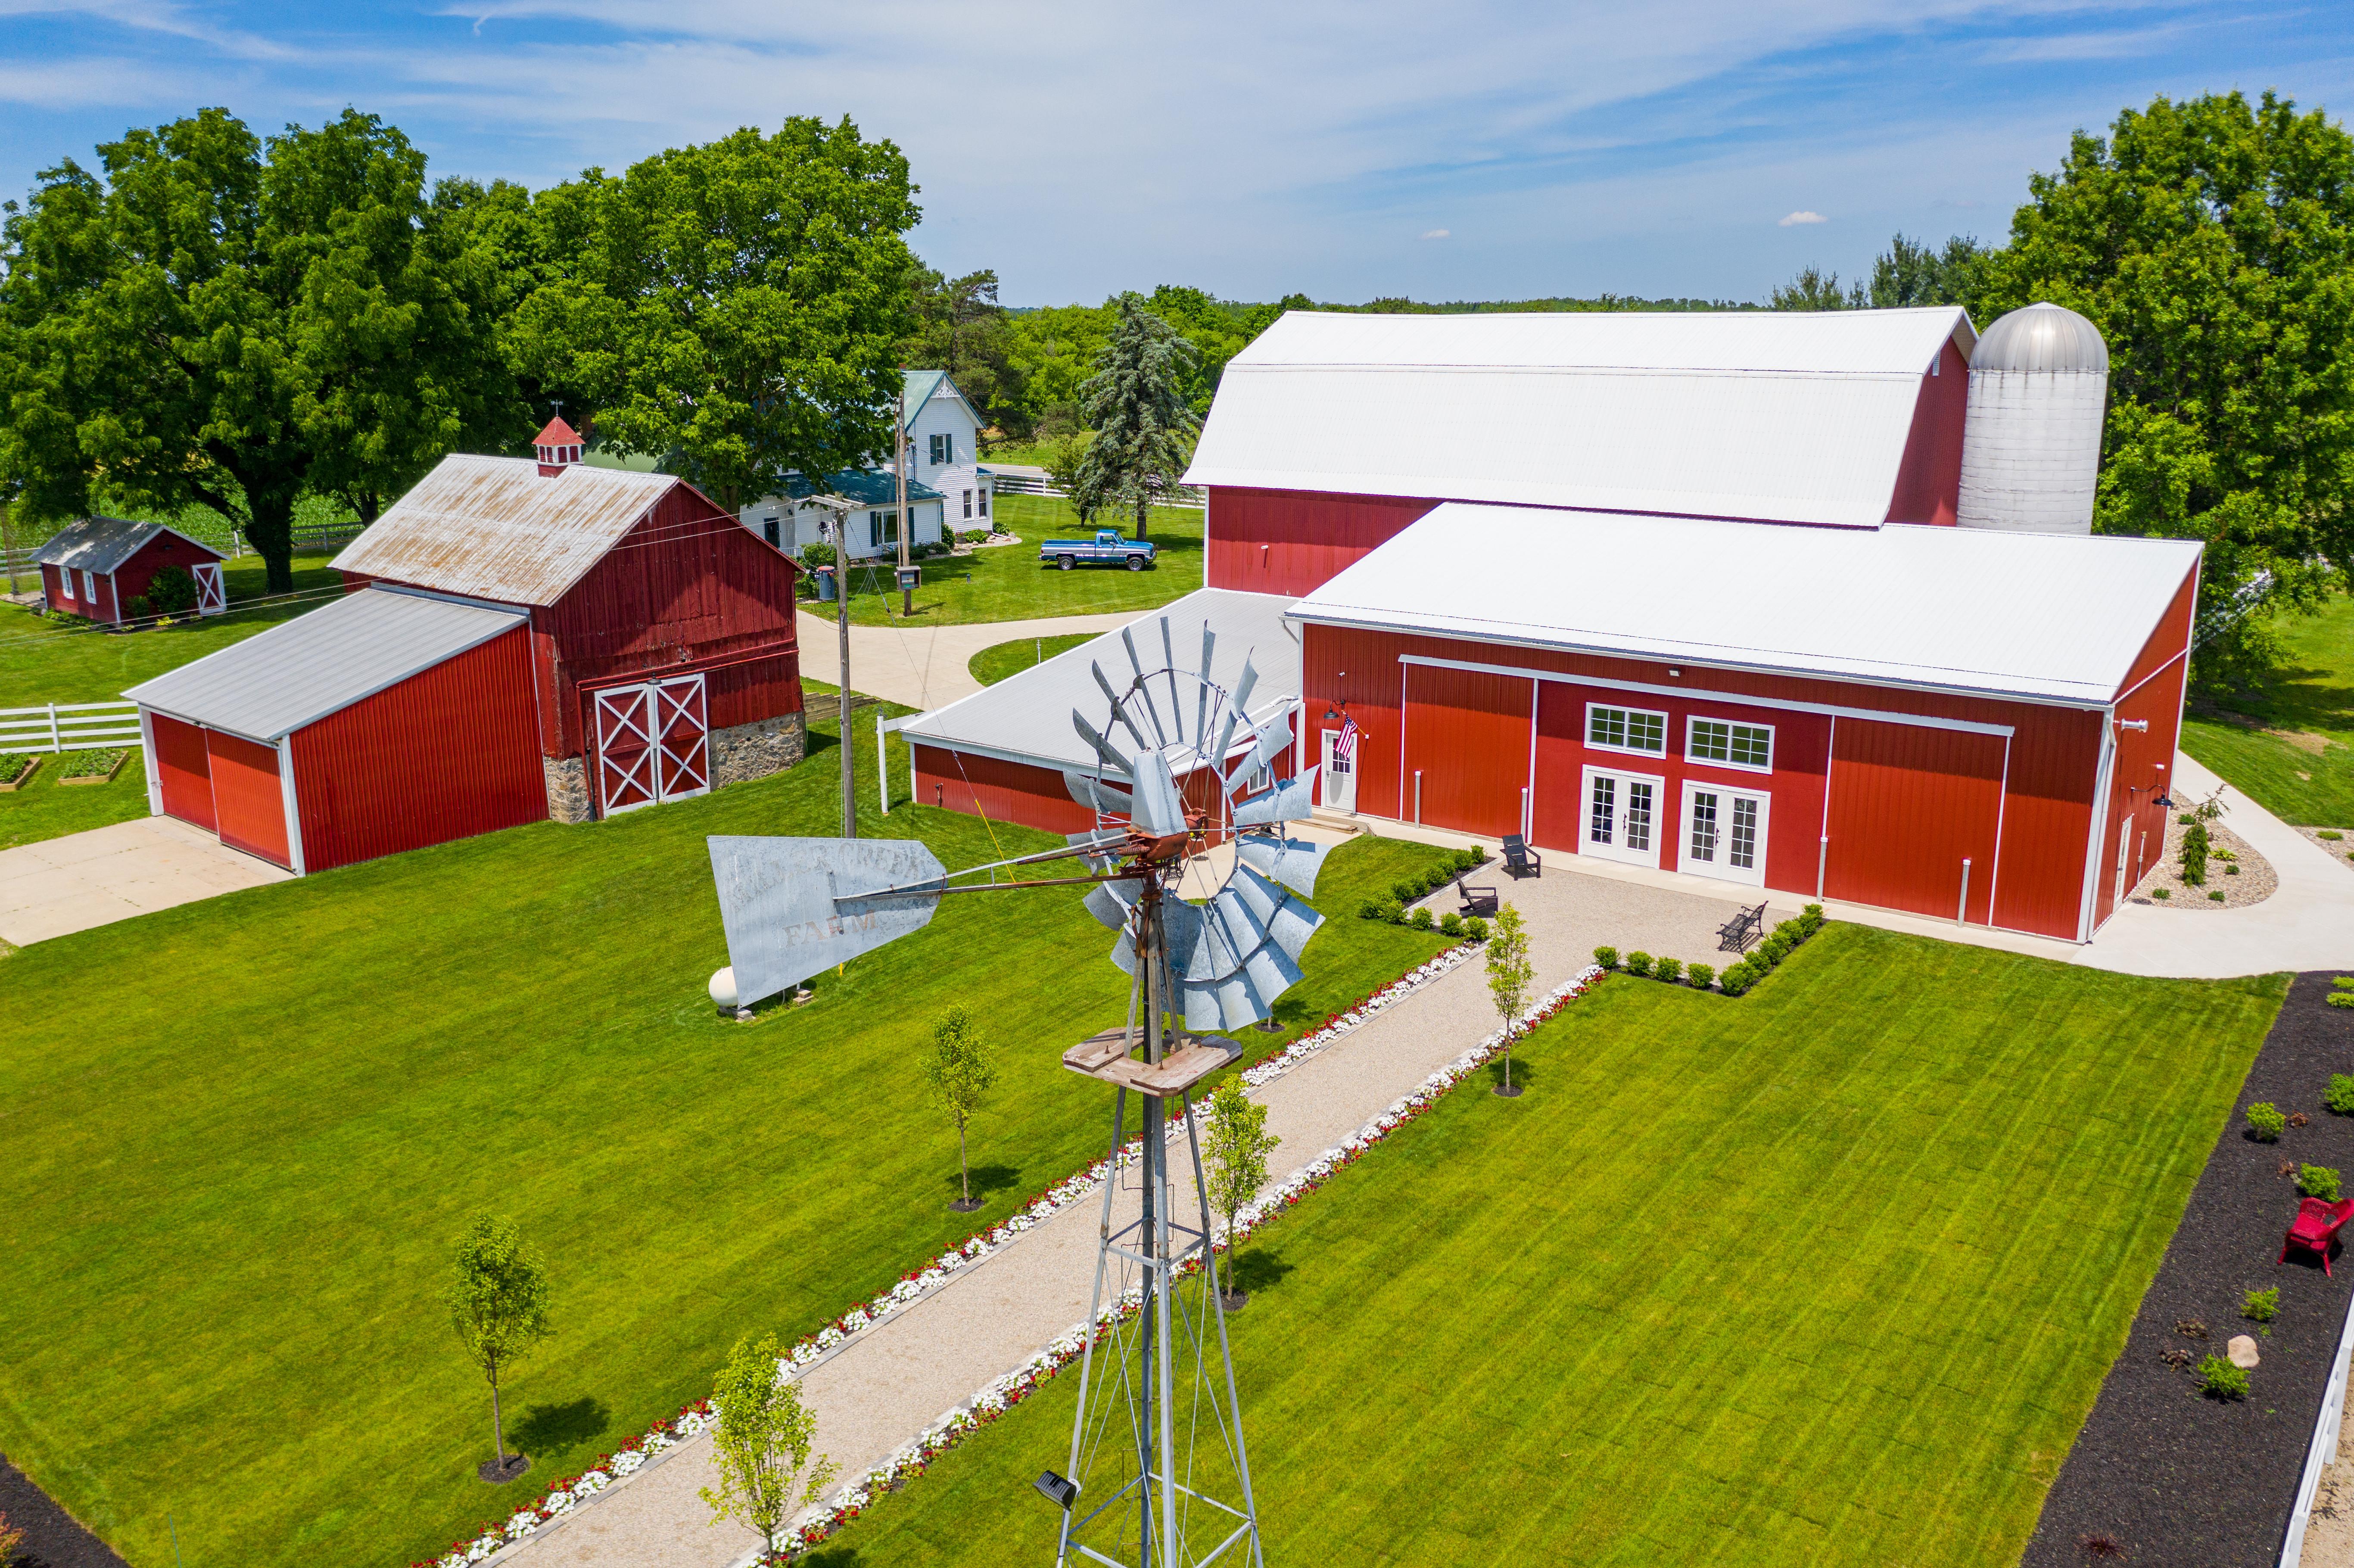 Book Tour of Farm